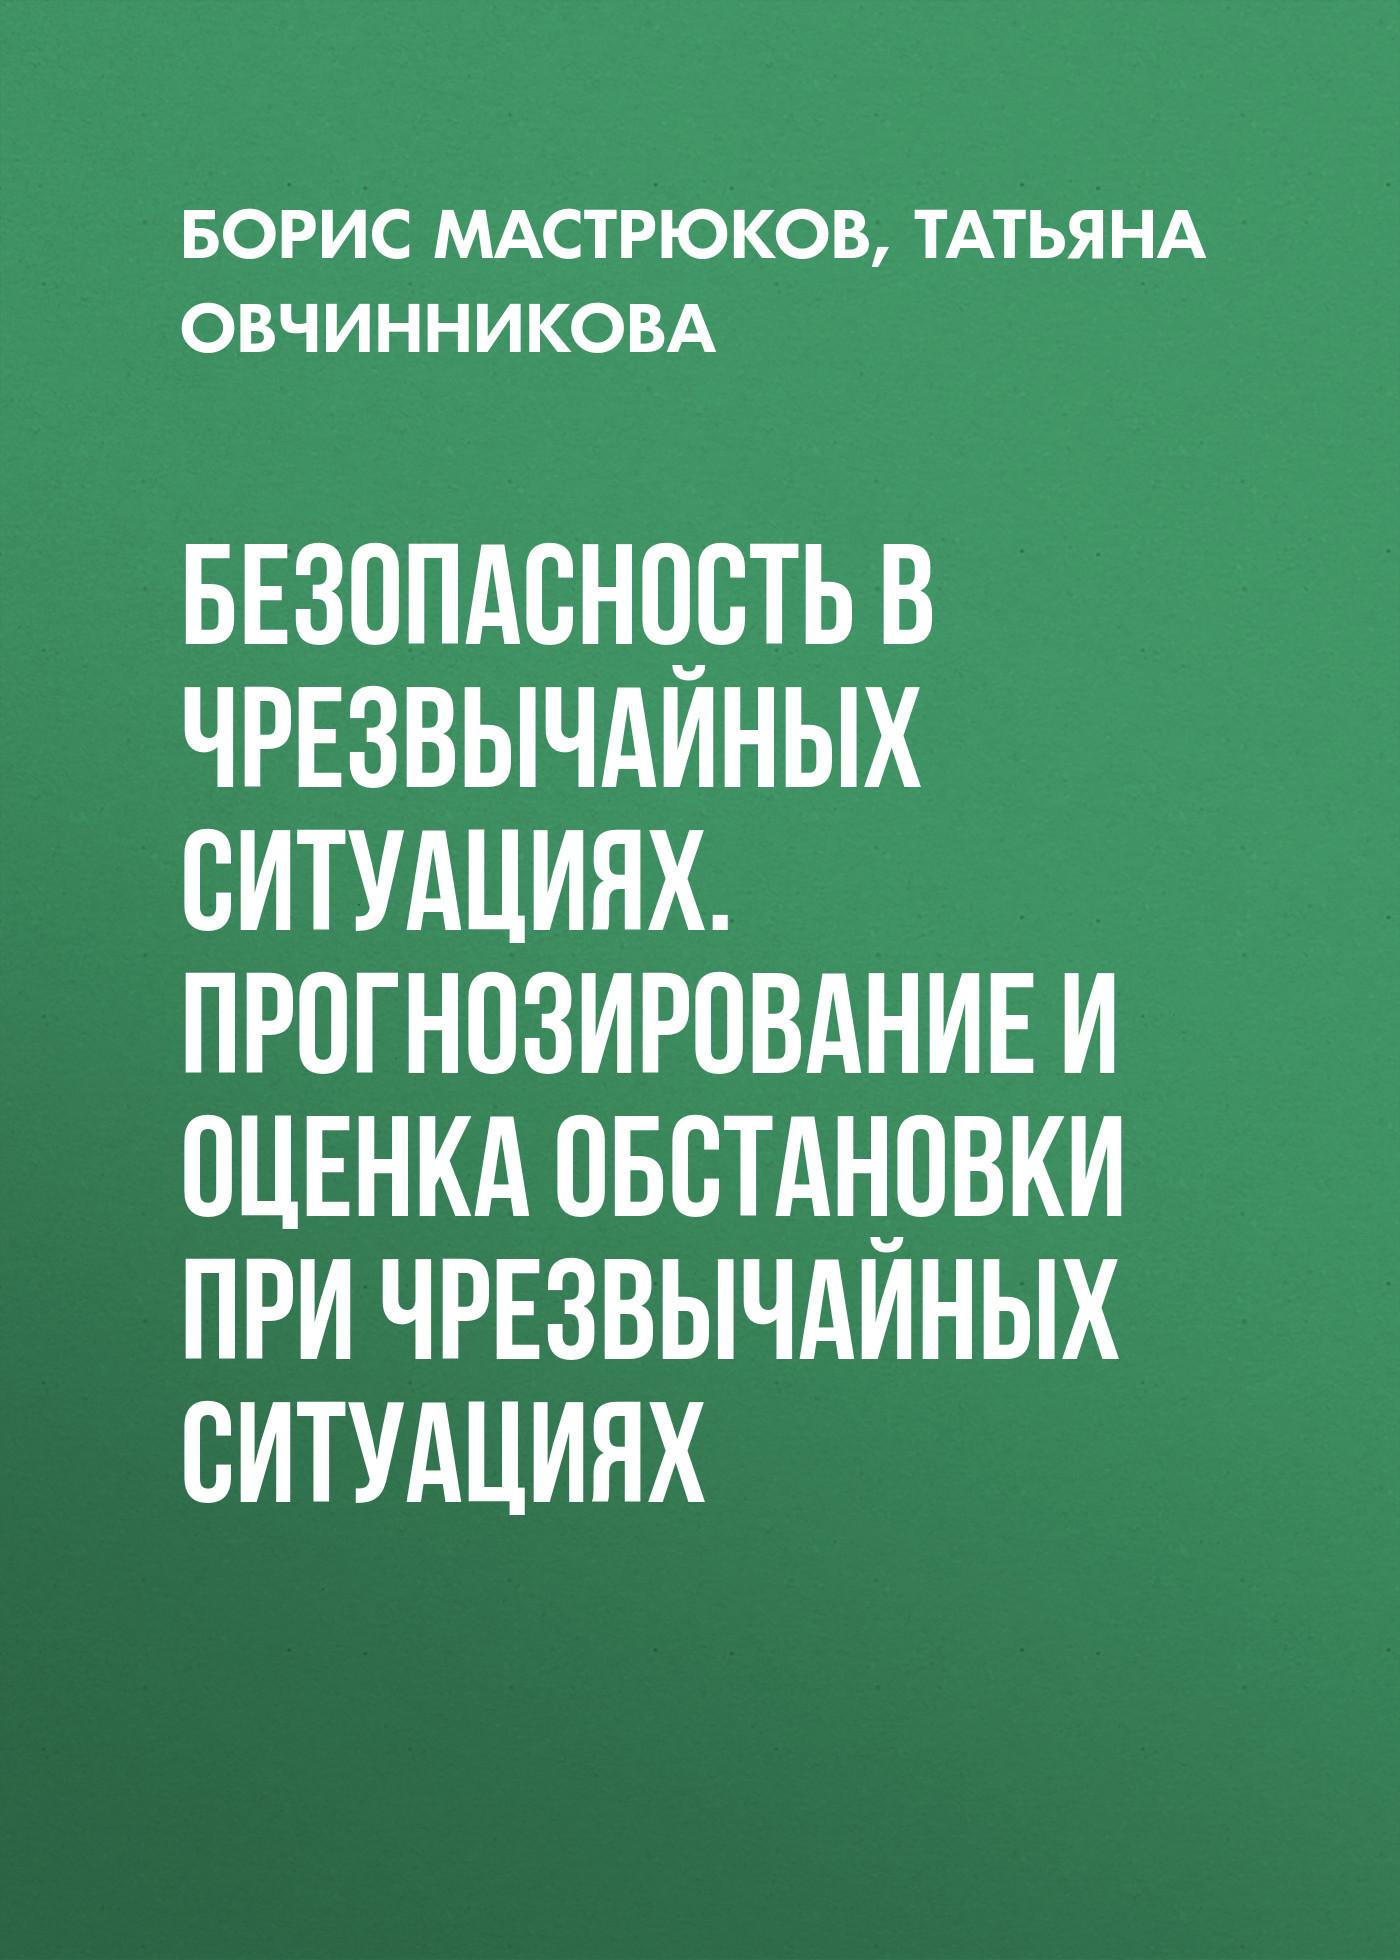 Борис Мастрюков бесплатно